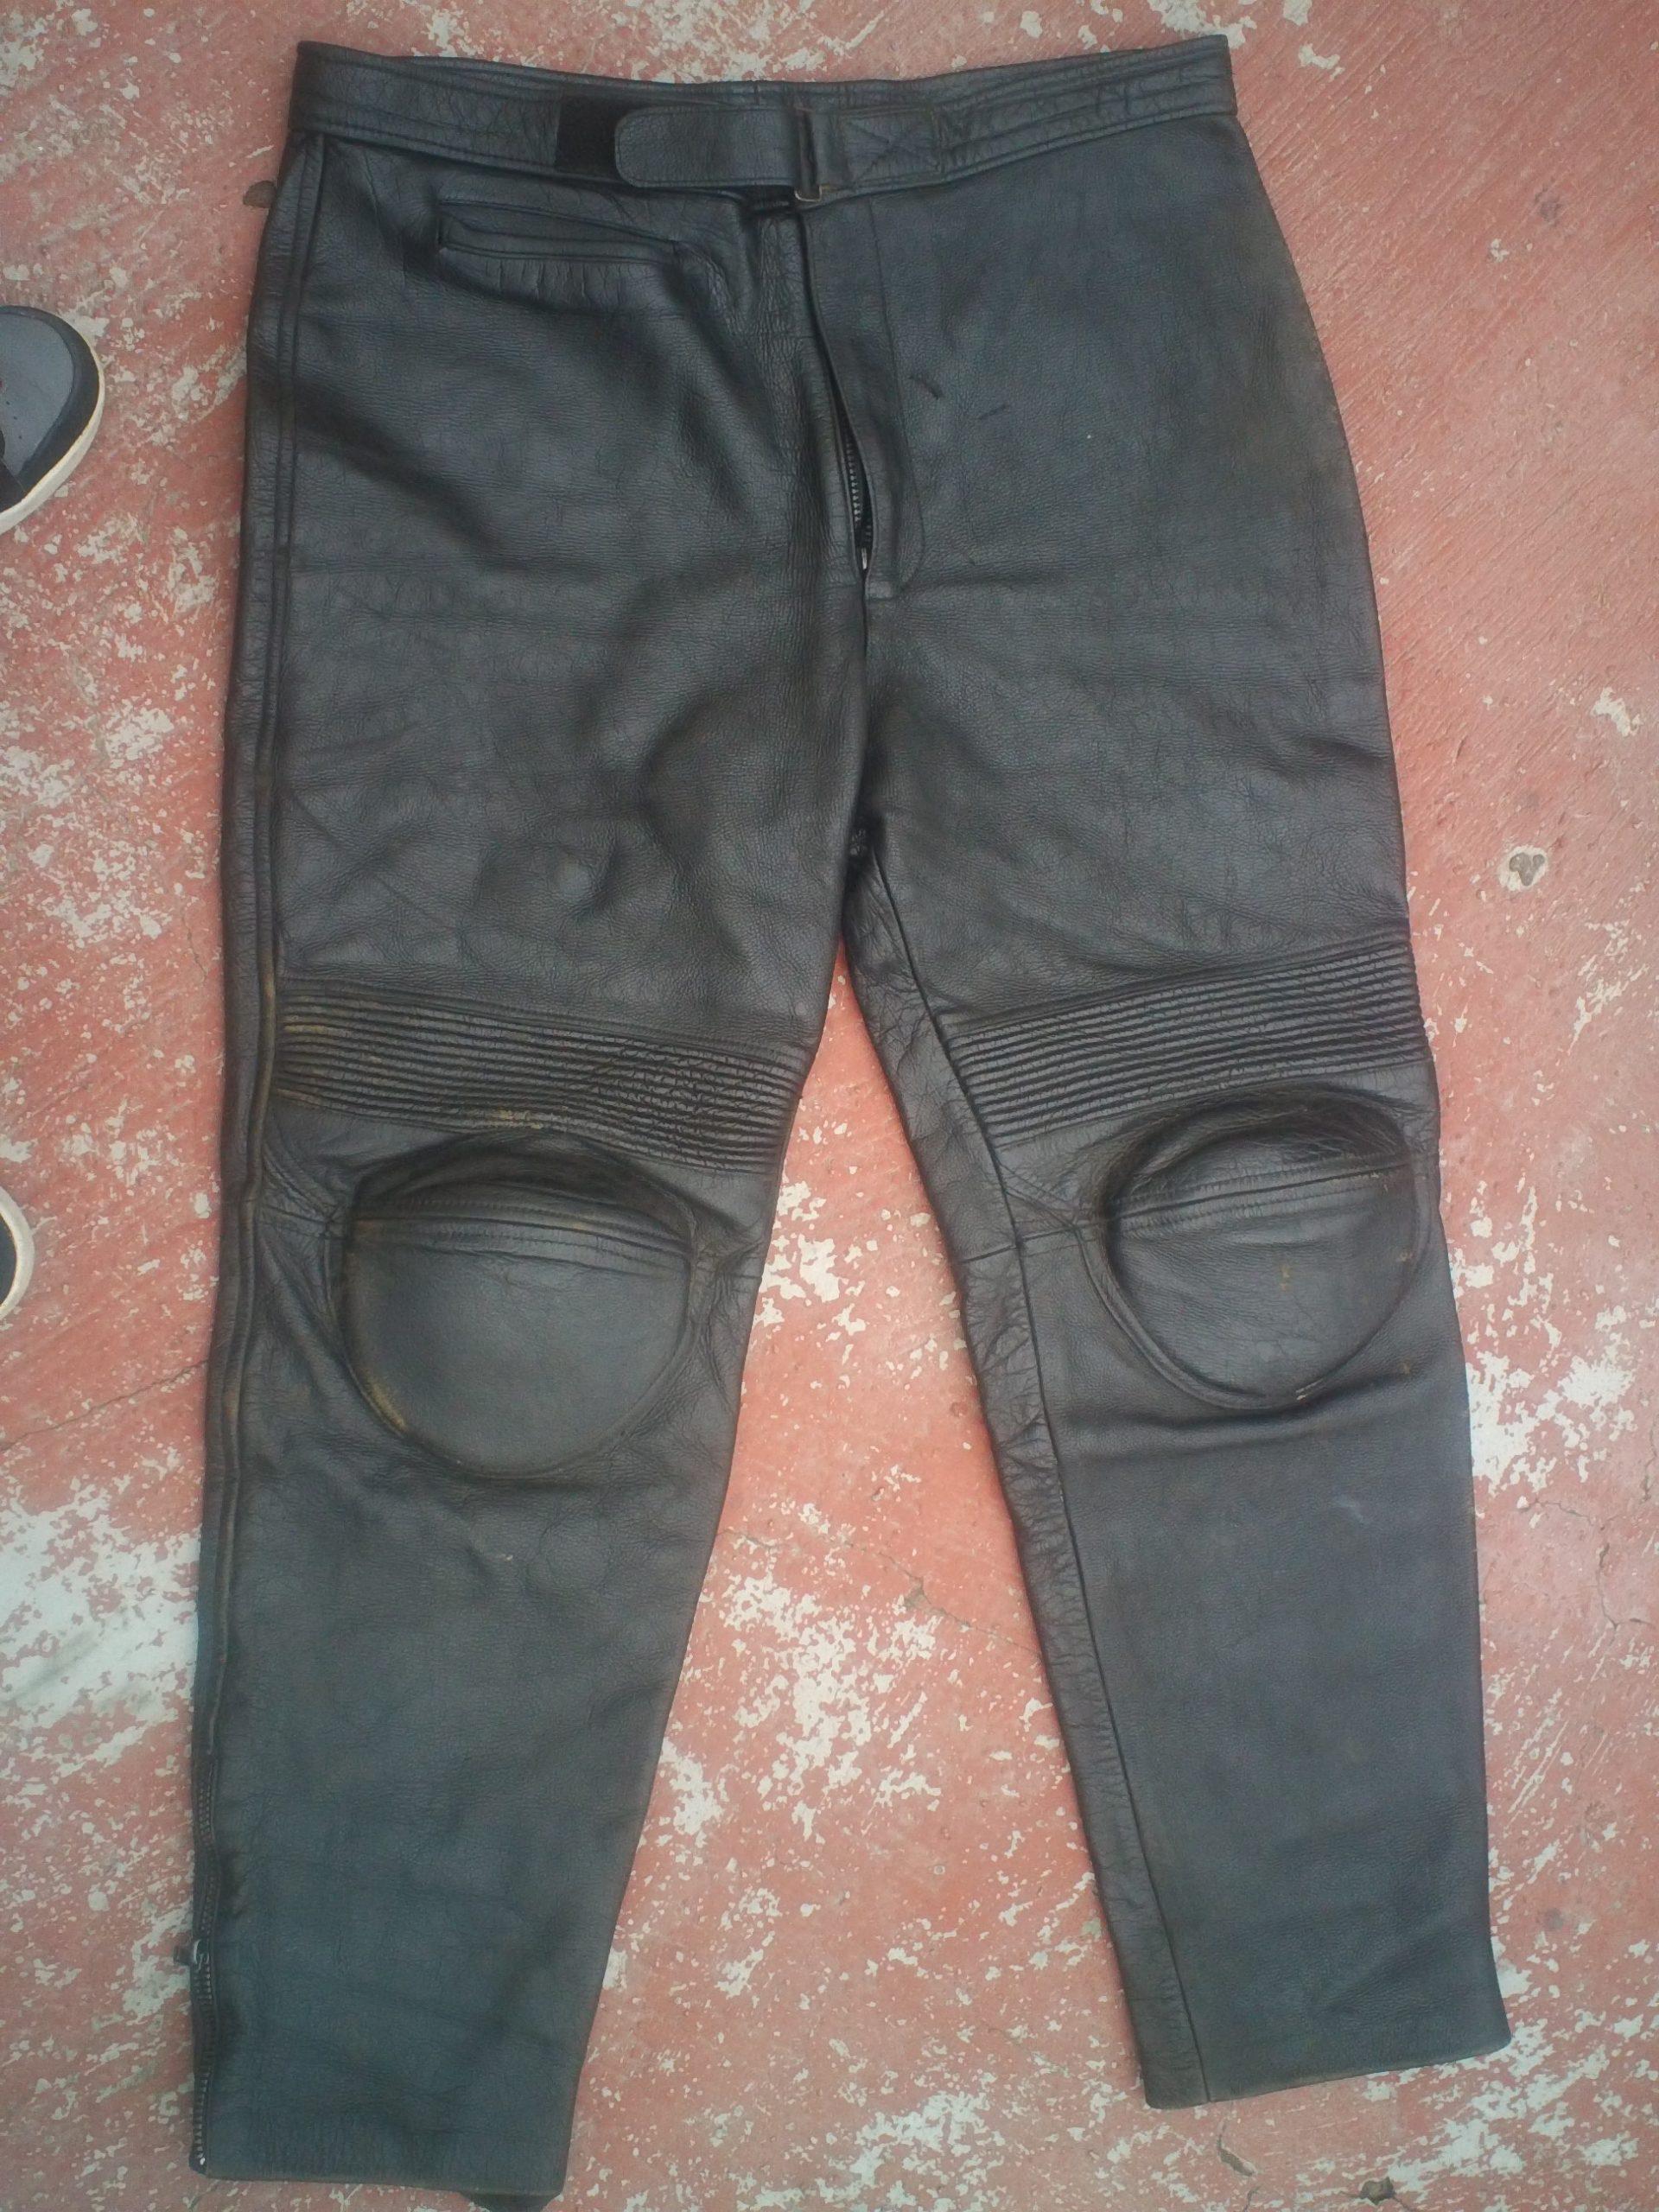 Pantalon de Piel gruesa para Motociclista